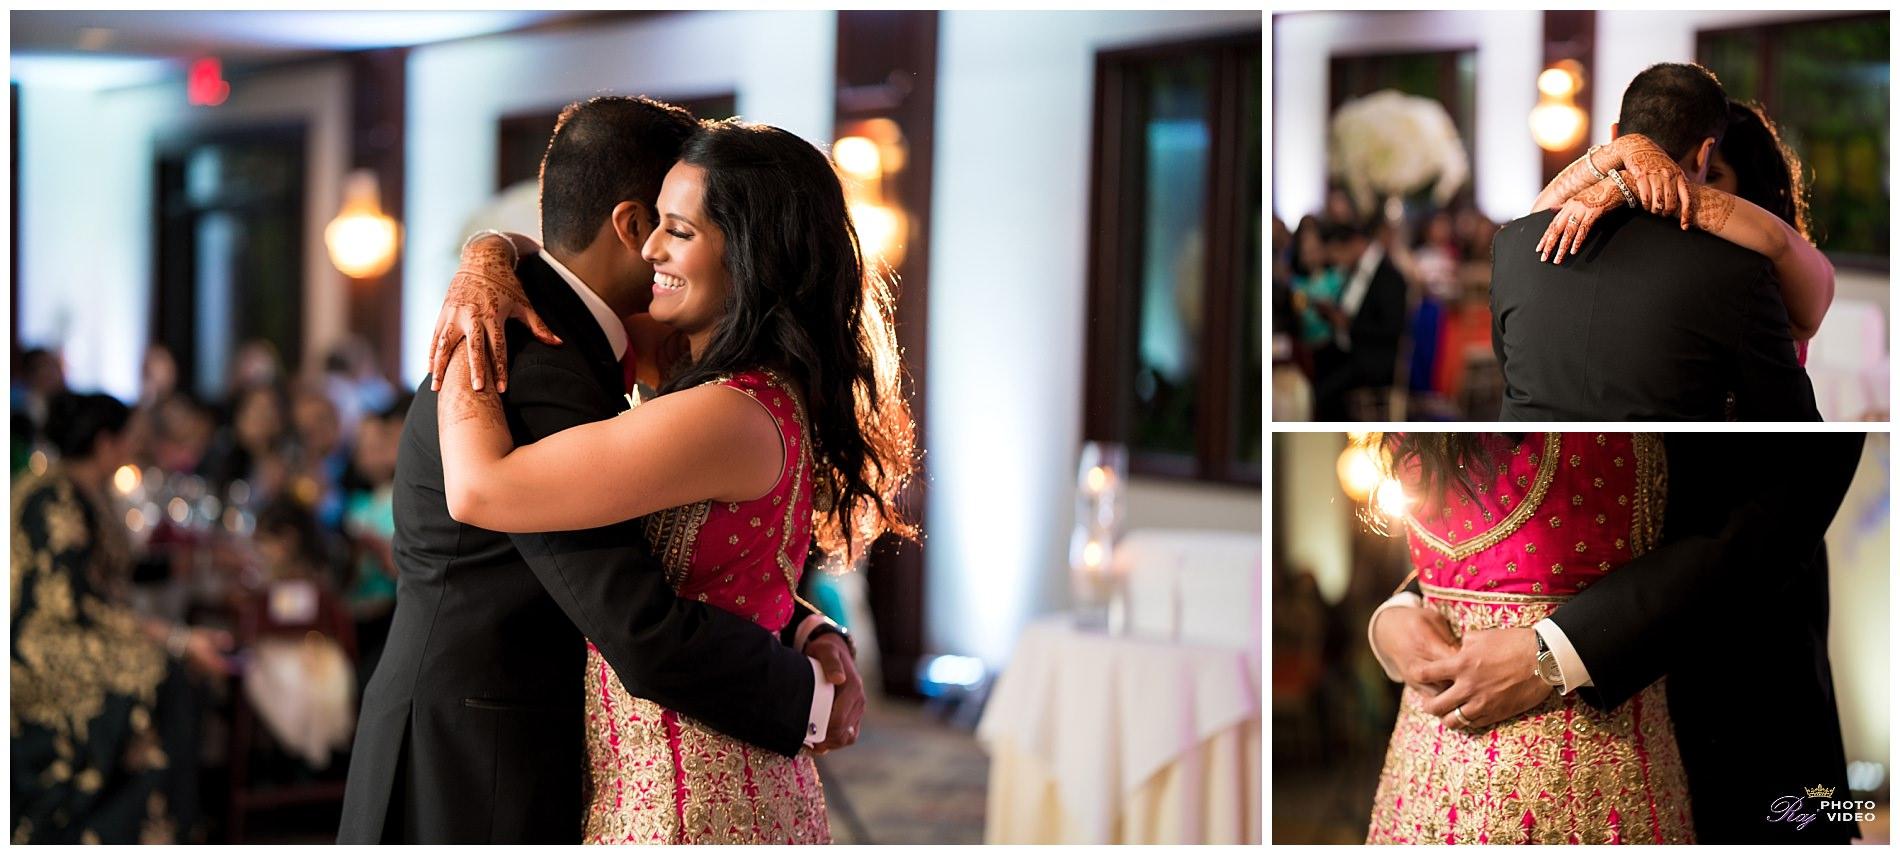 Martinsville-Gardens-NJ-Indian-Wedding-Ruchi-Vishal-56.jpg